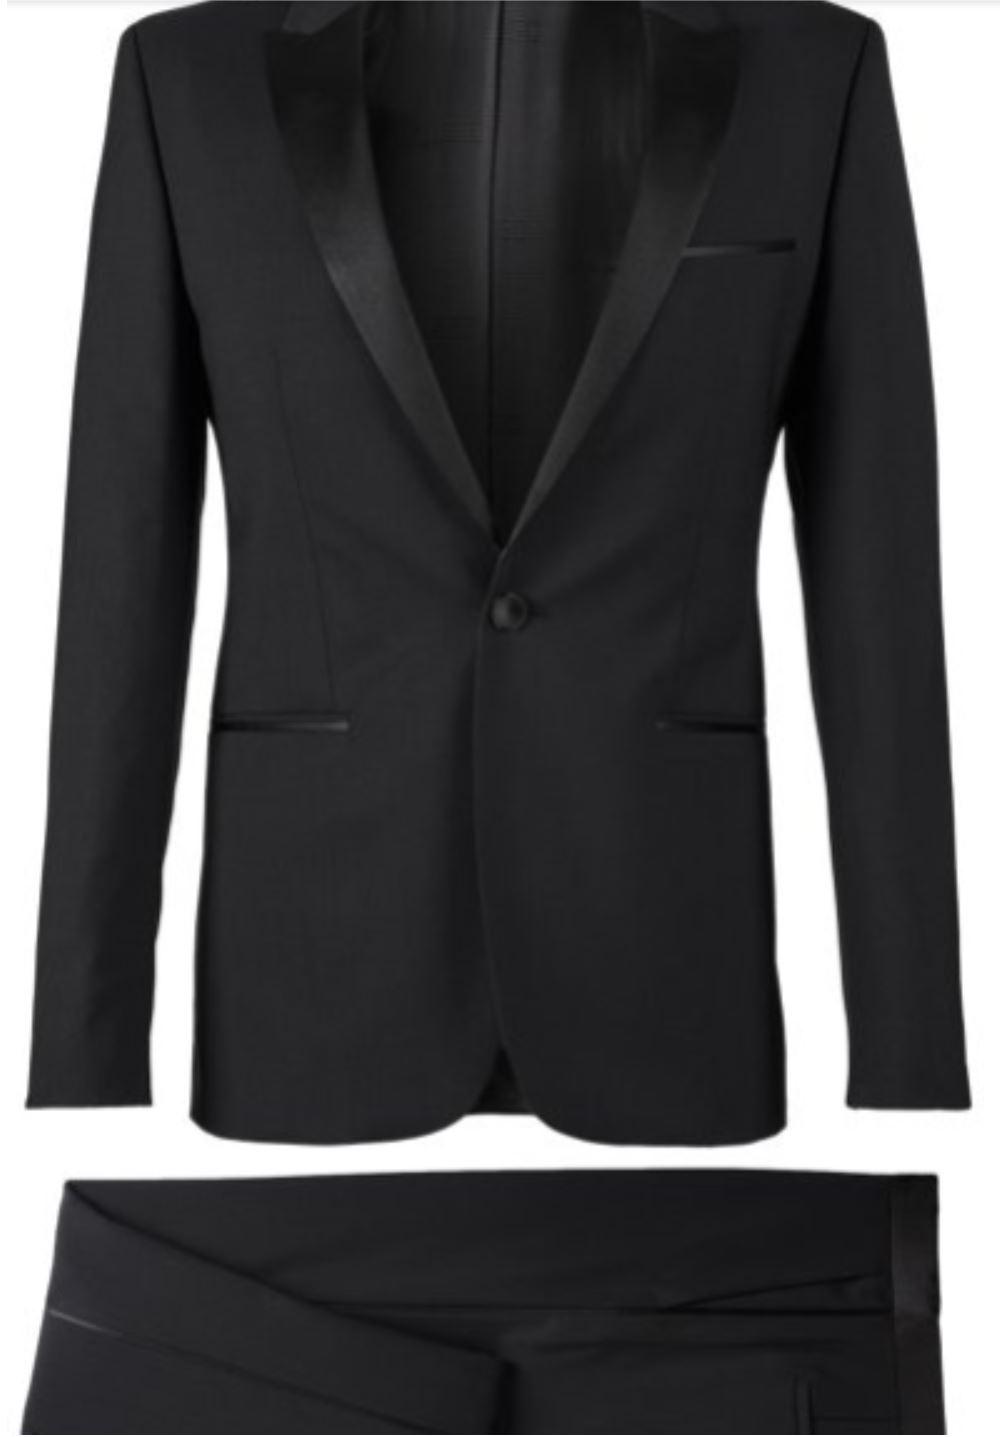 Black Suit from hugoboss.com